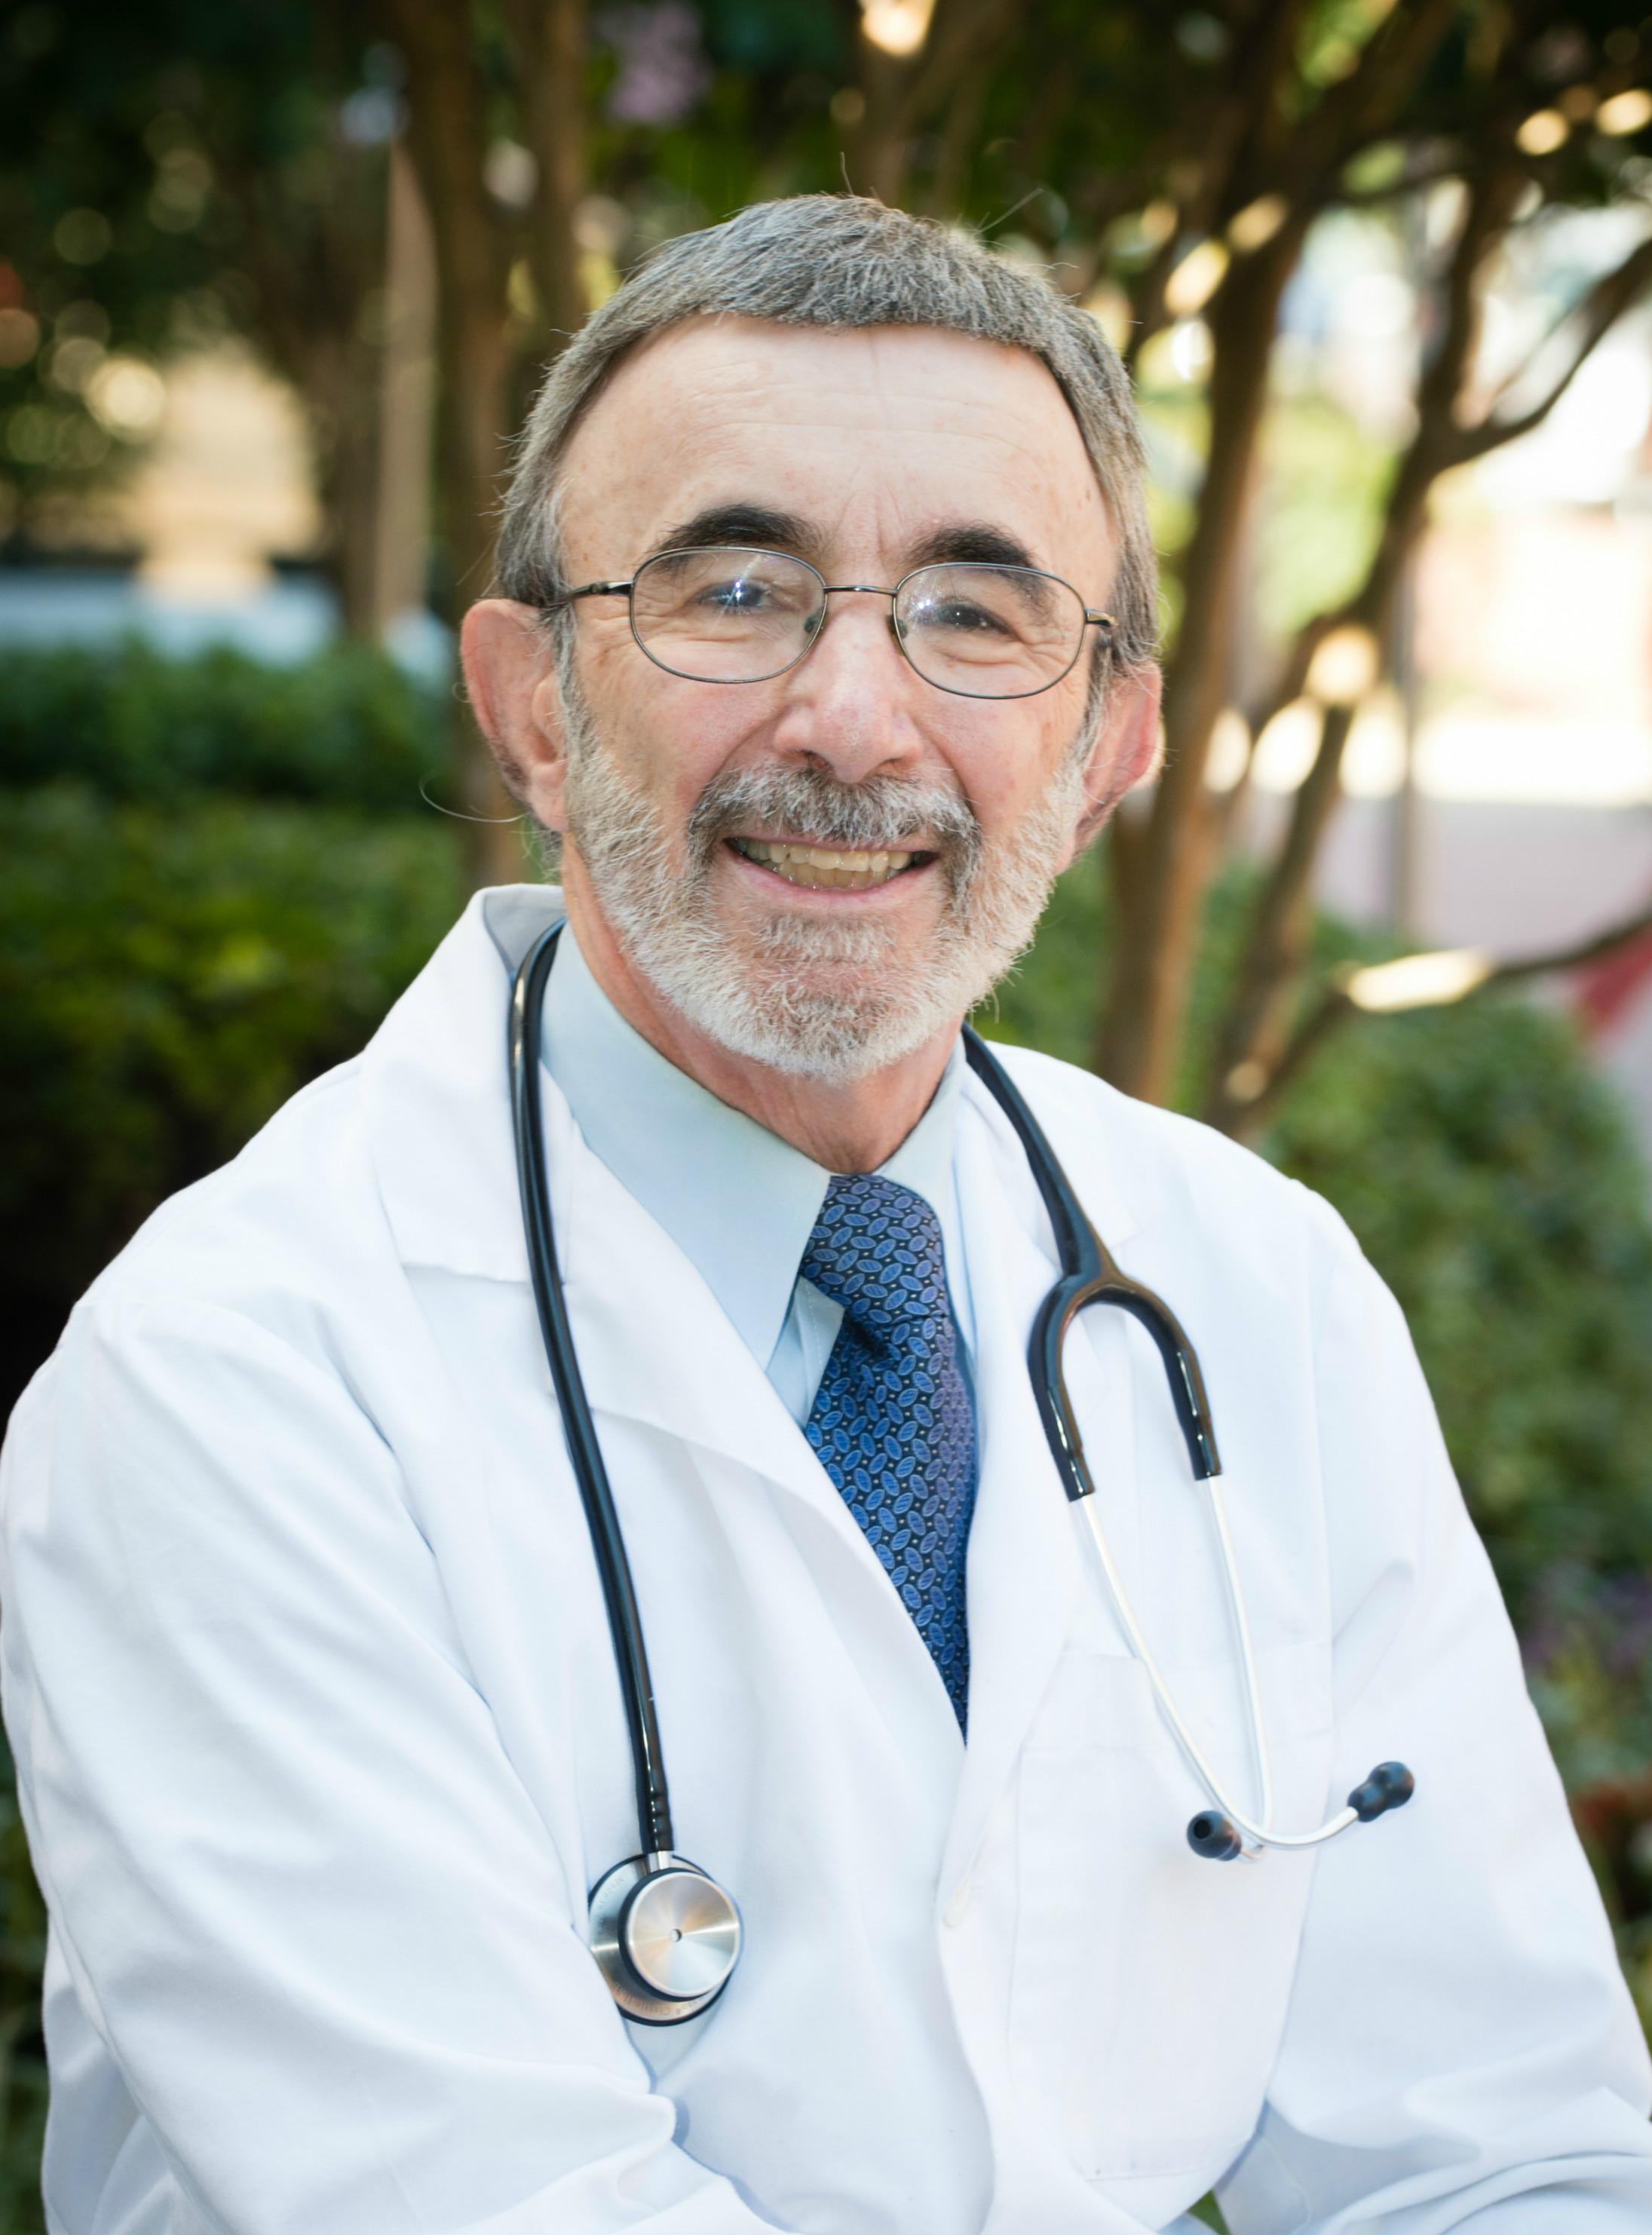 Richard Di Gioia, MD PC